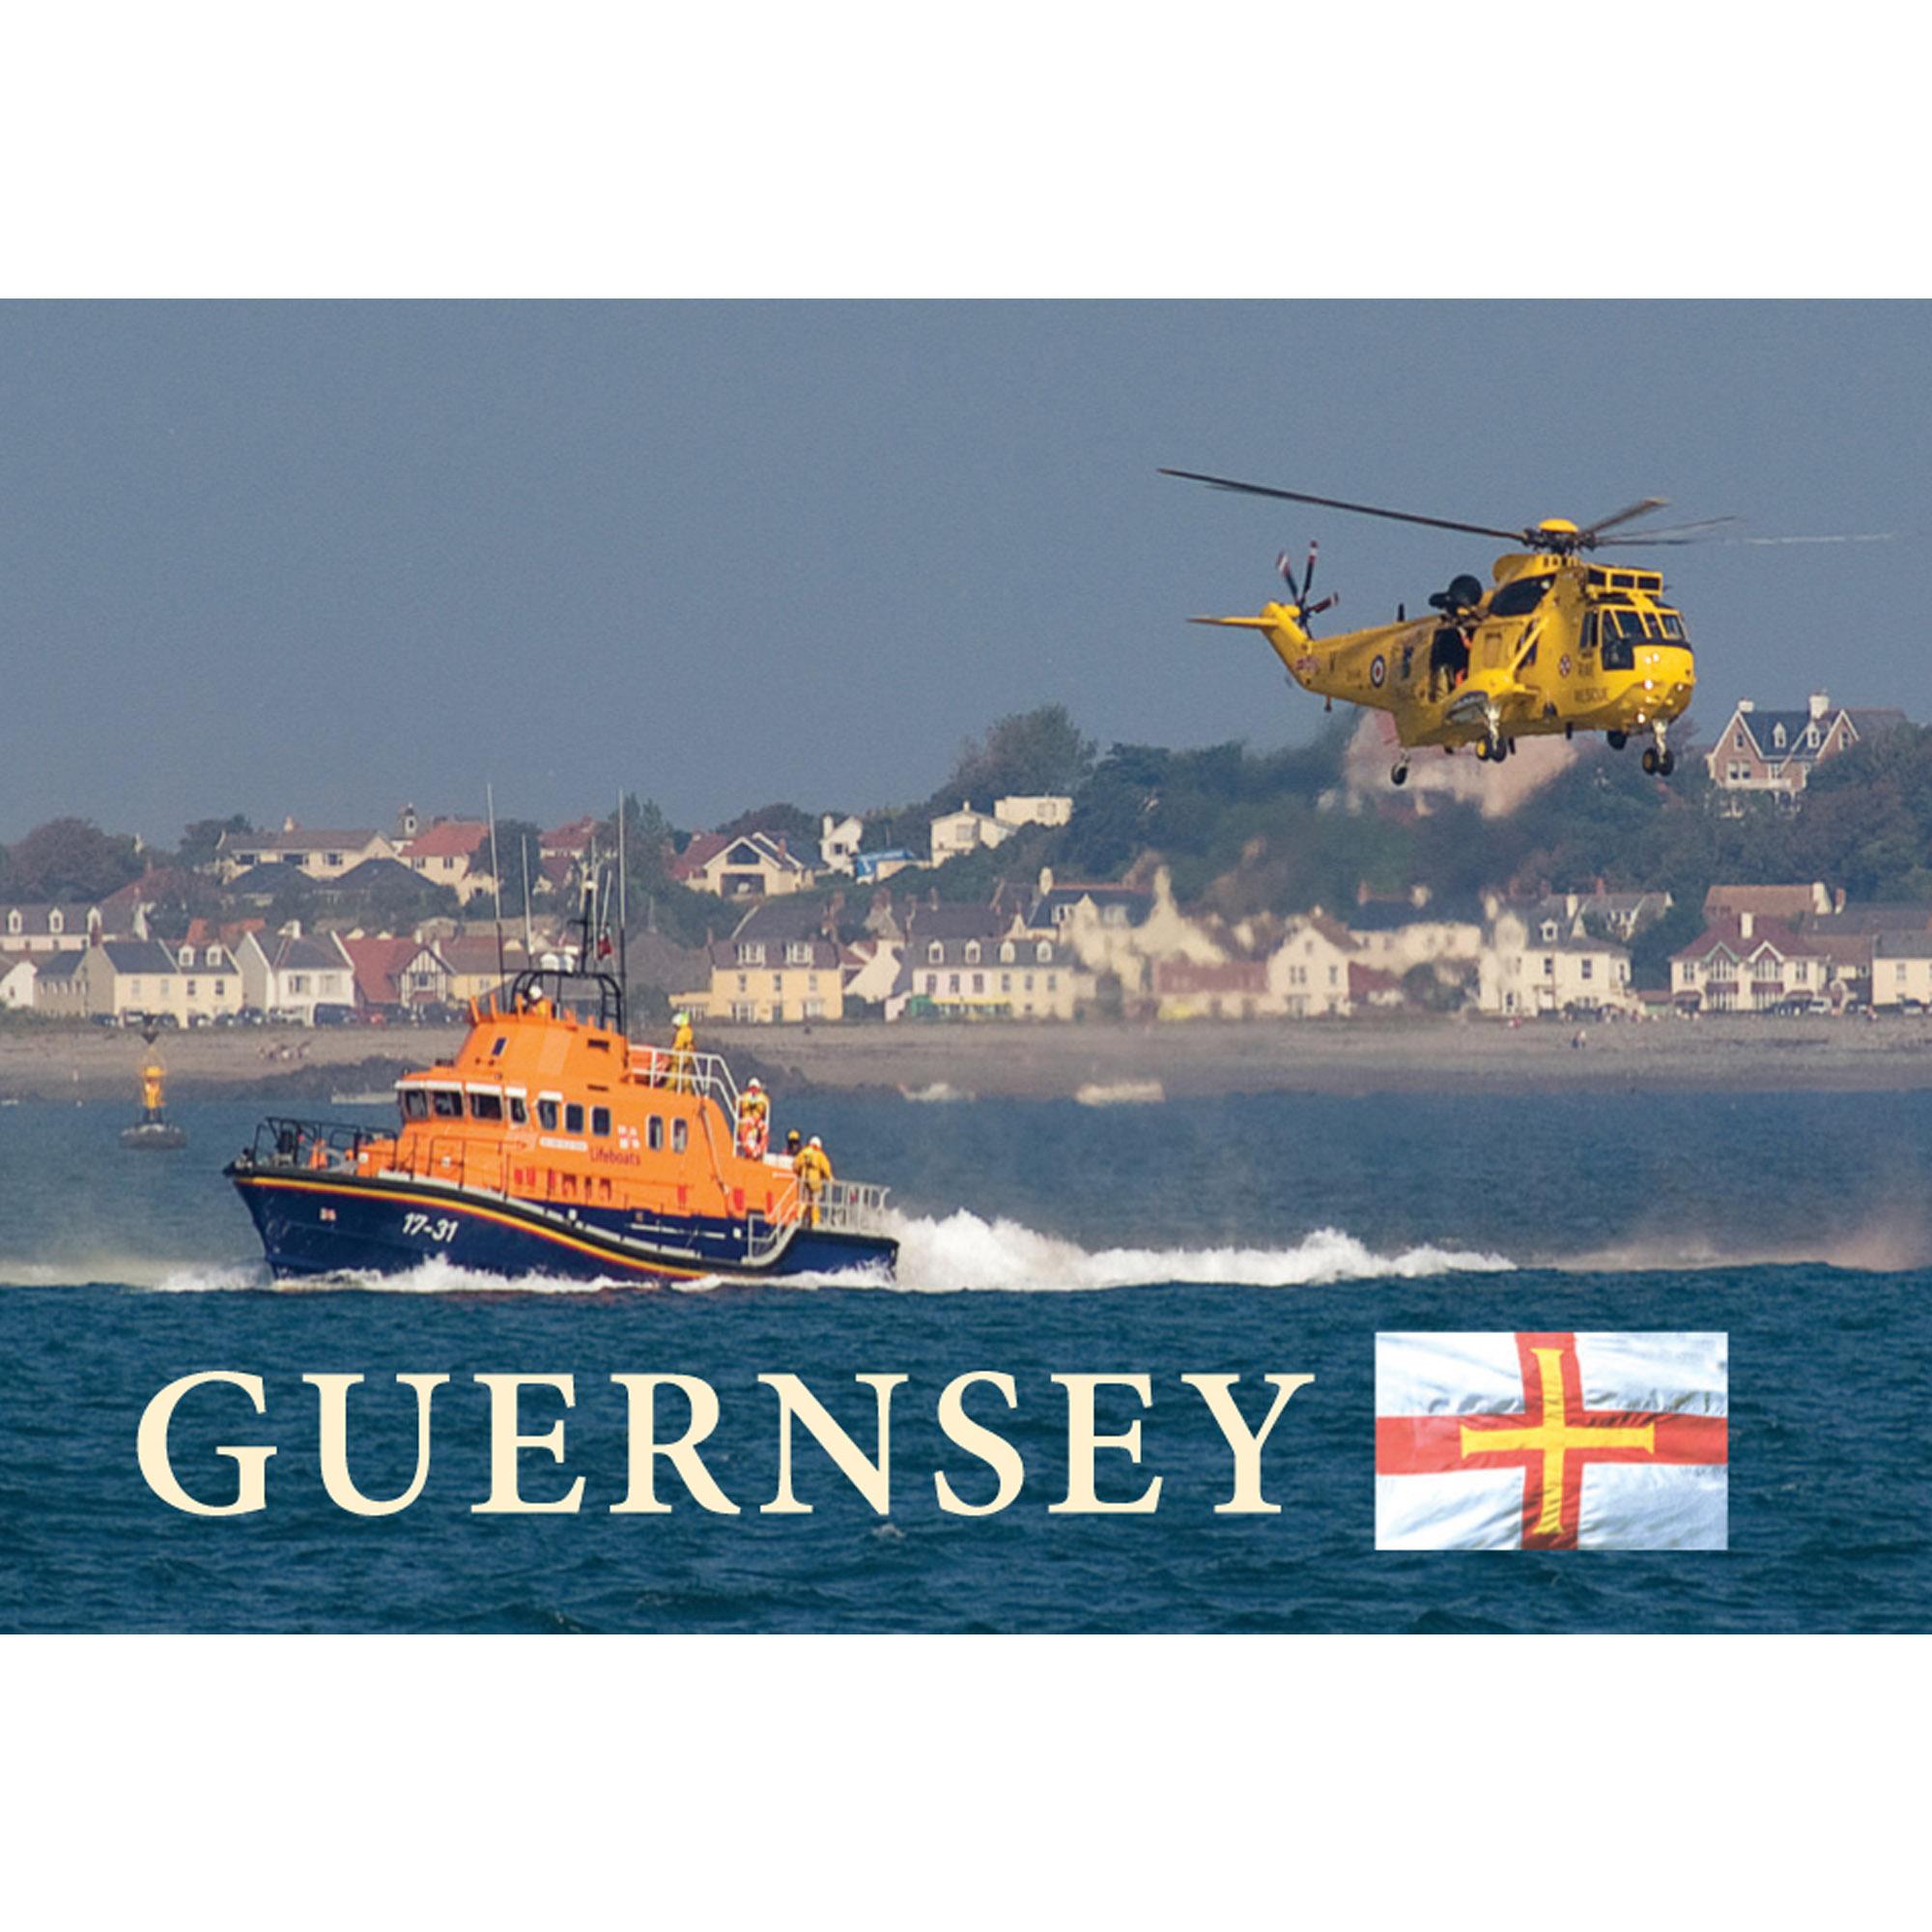 Guernsey fridge magnet